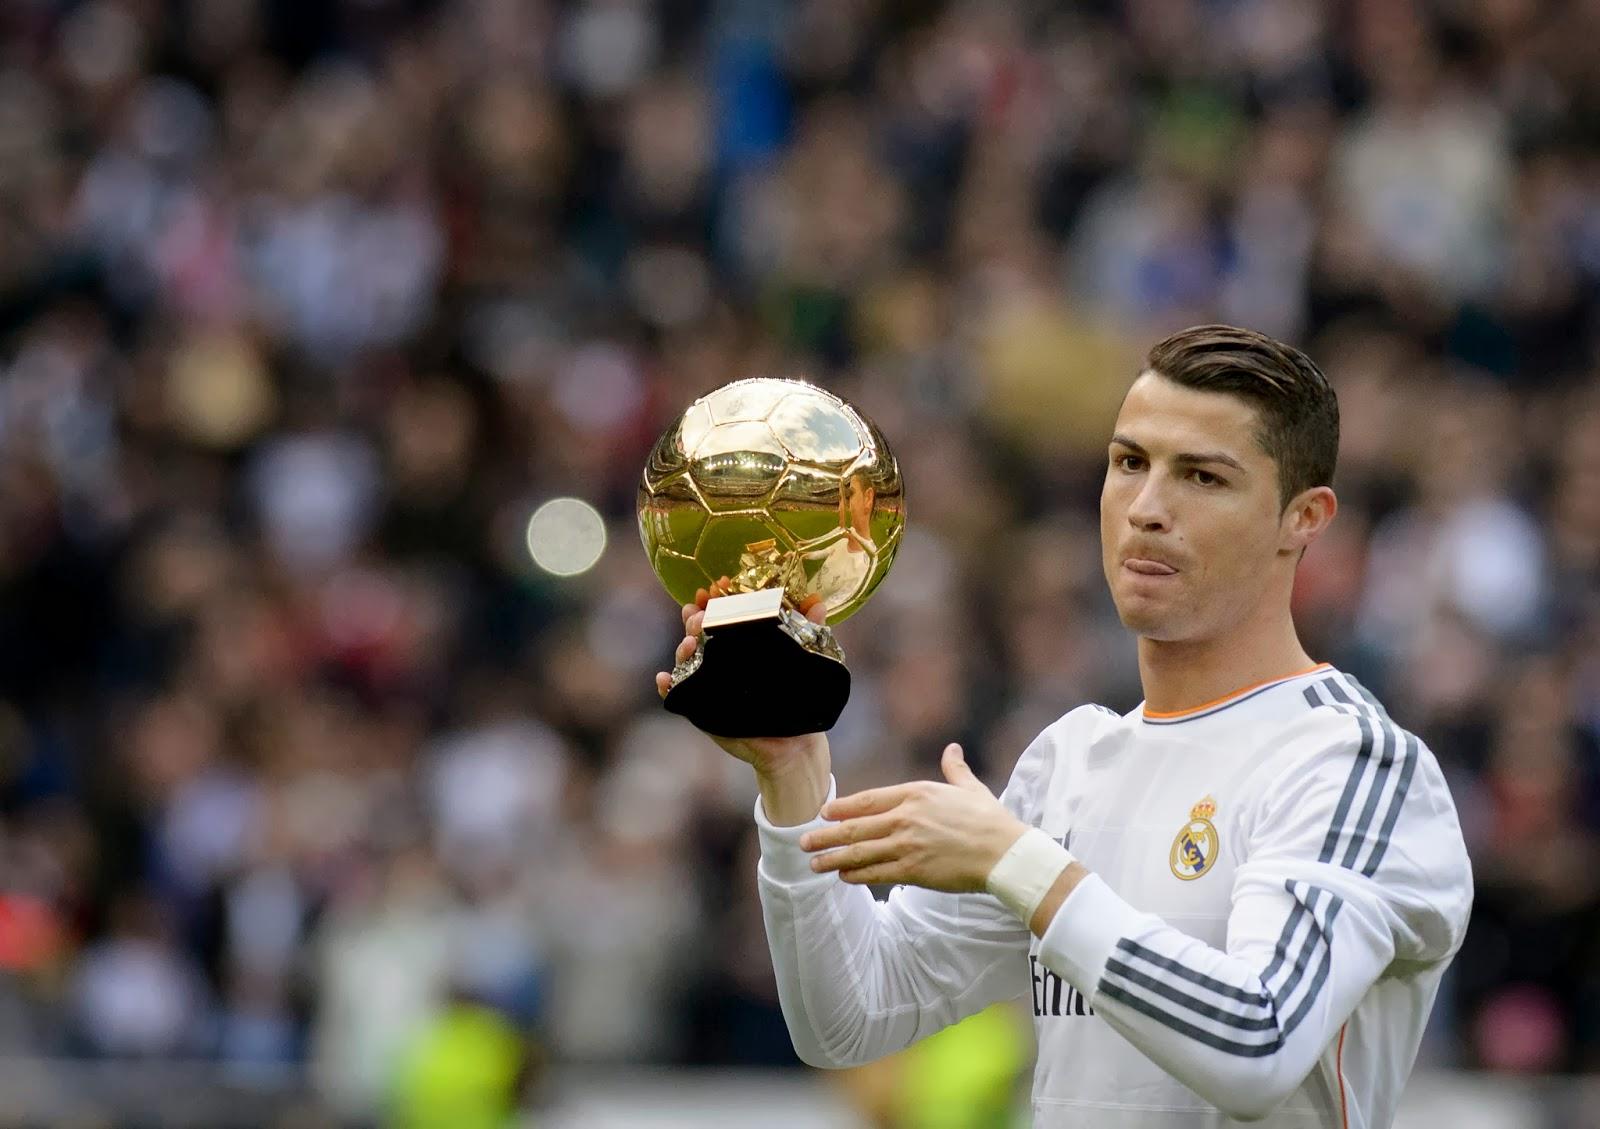 Cristiano Ronaldo, Ballon d'Or, Golden Ball, Trophy, Footballer, Football, Sports, Real Madrid, FC Granada, Santiago Bernabeu, Madrid, Stadium, FIFA Ballon d'Or, FIFA,